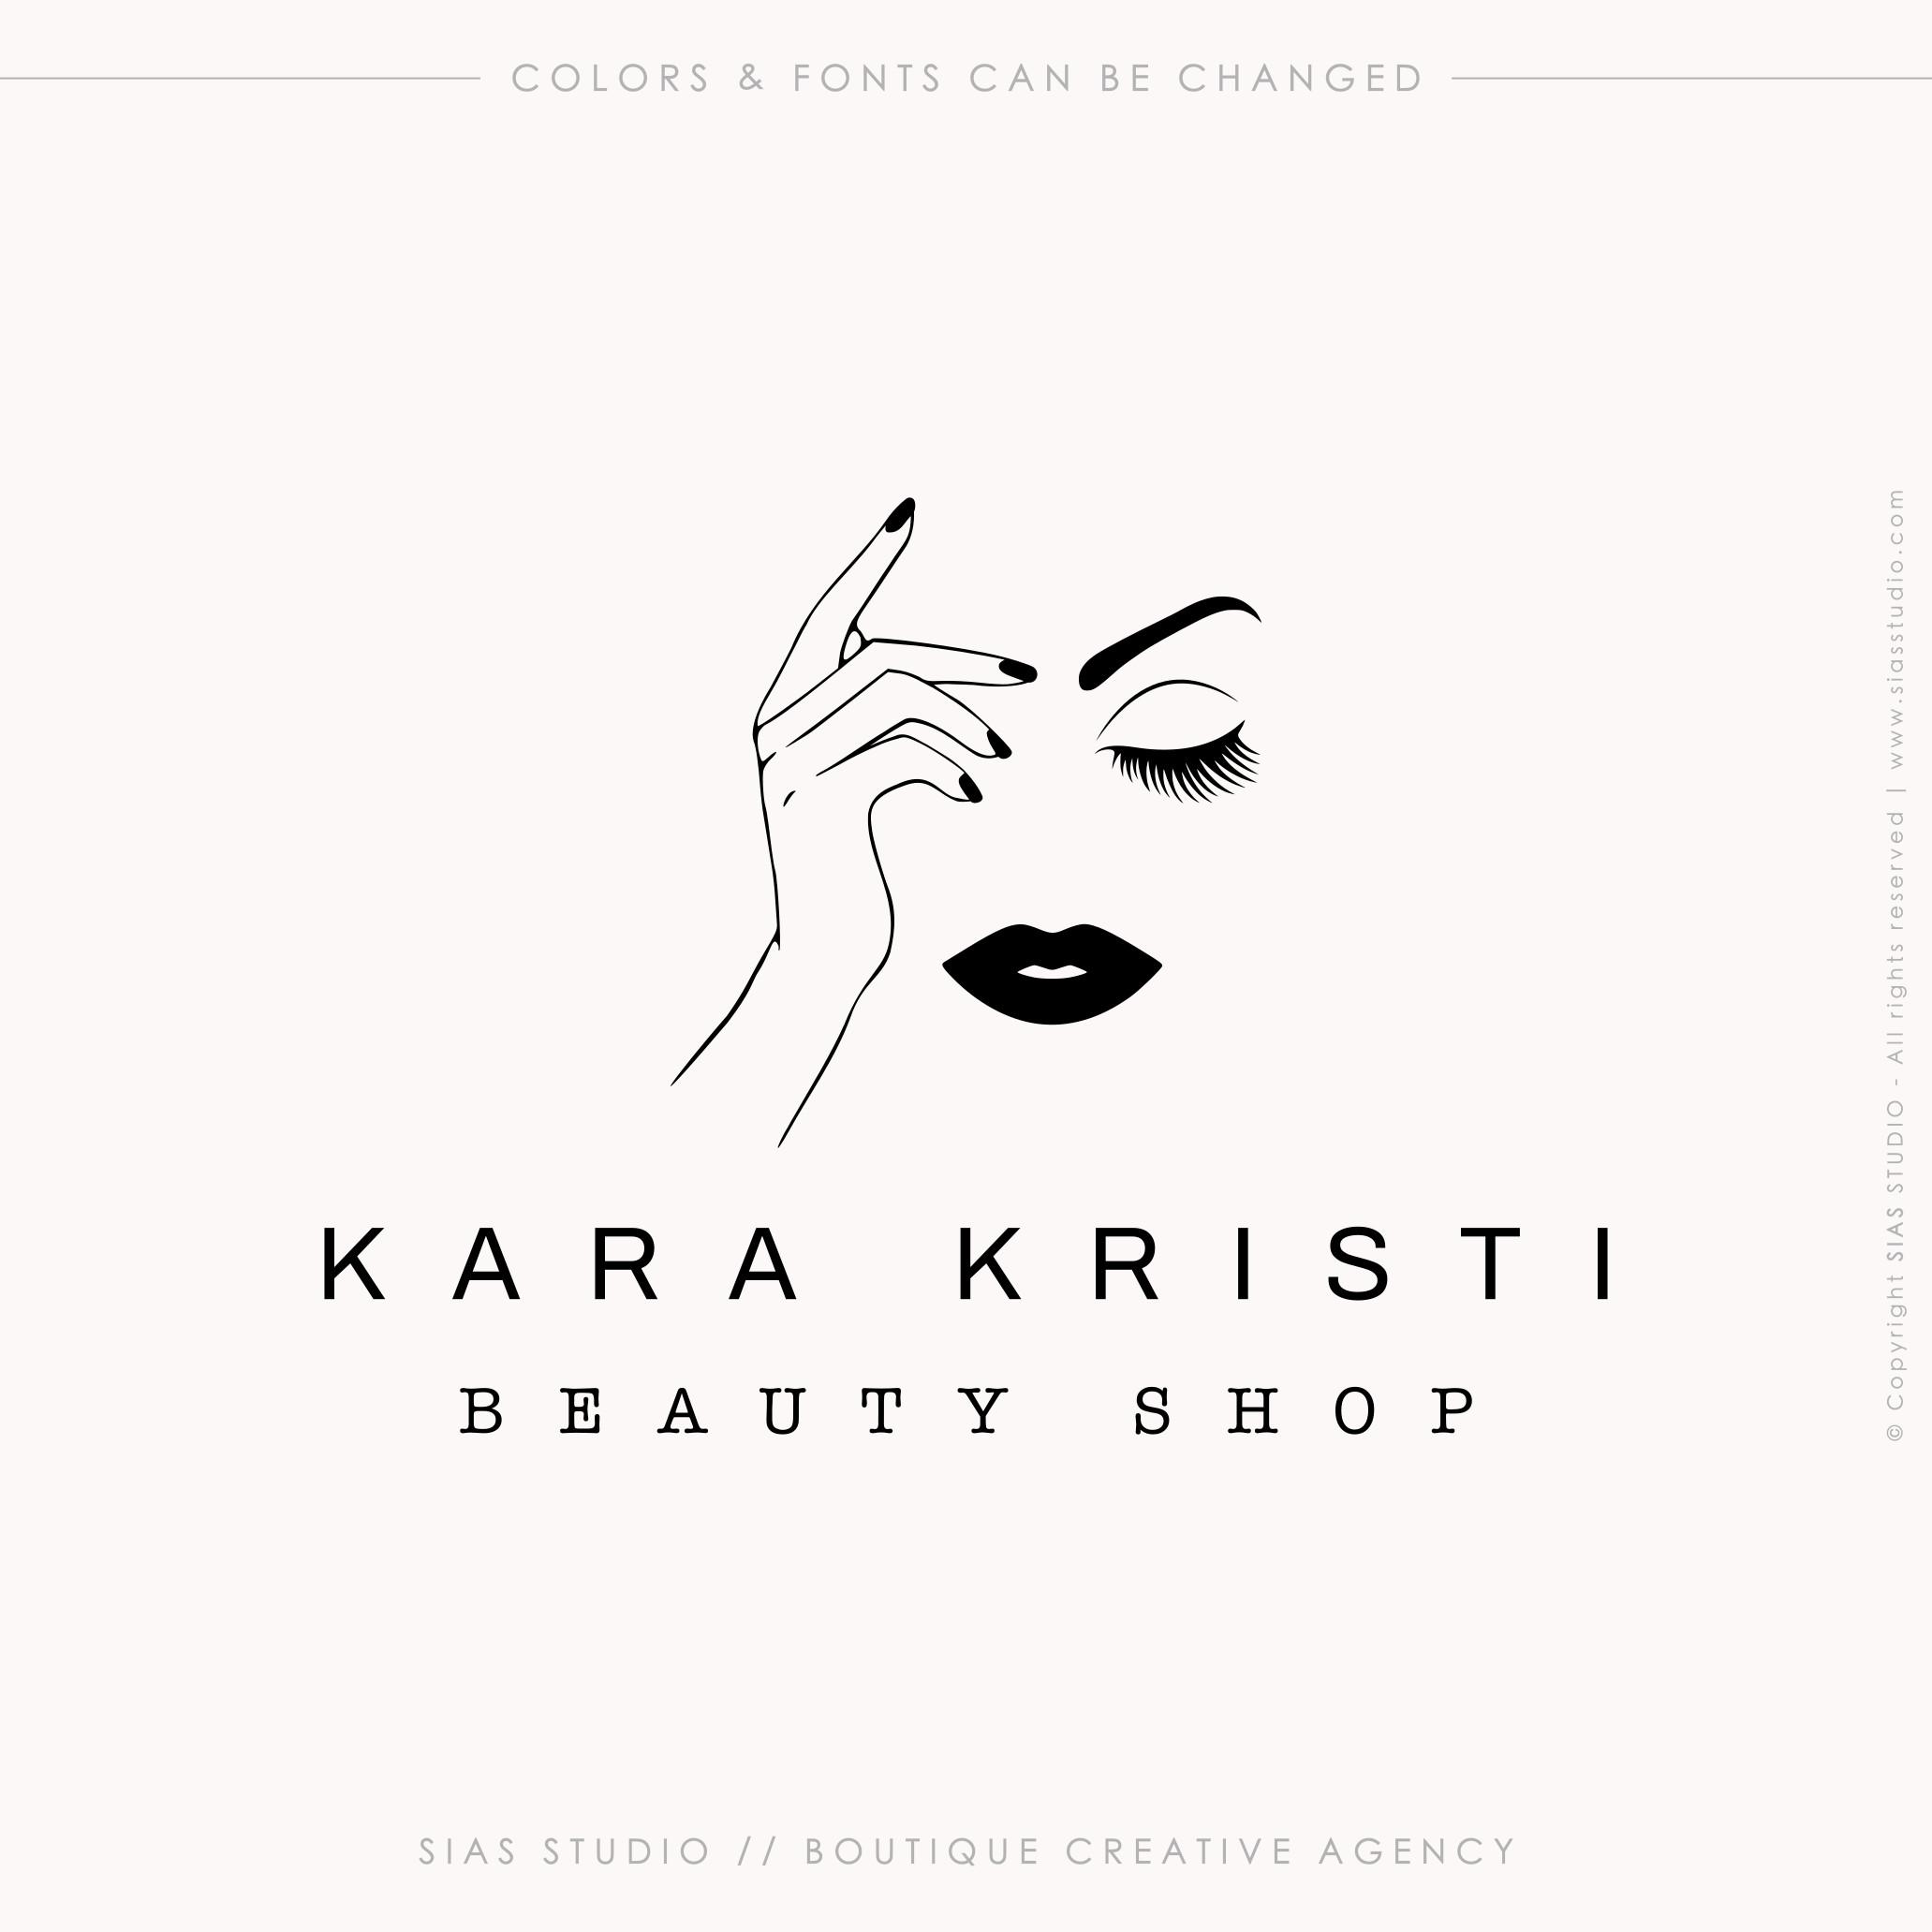 Kara Kristi Beauty Logo Design With Woman Sias Studio